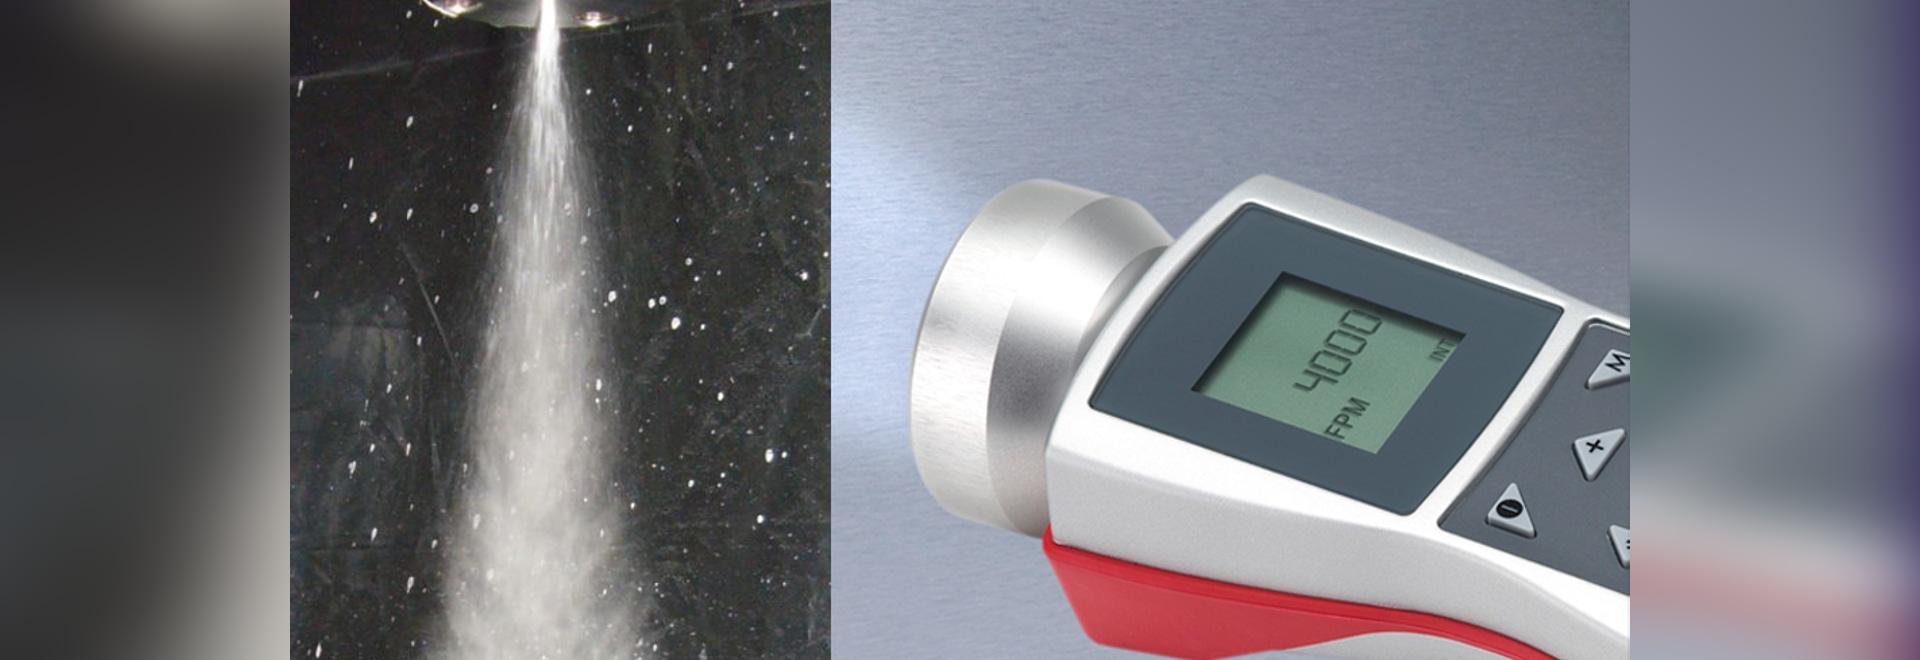 Determining the pulsation rate of sprays with portable stroboscope RT STROBE pocketLED